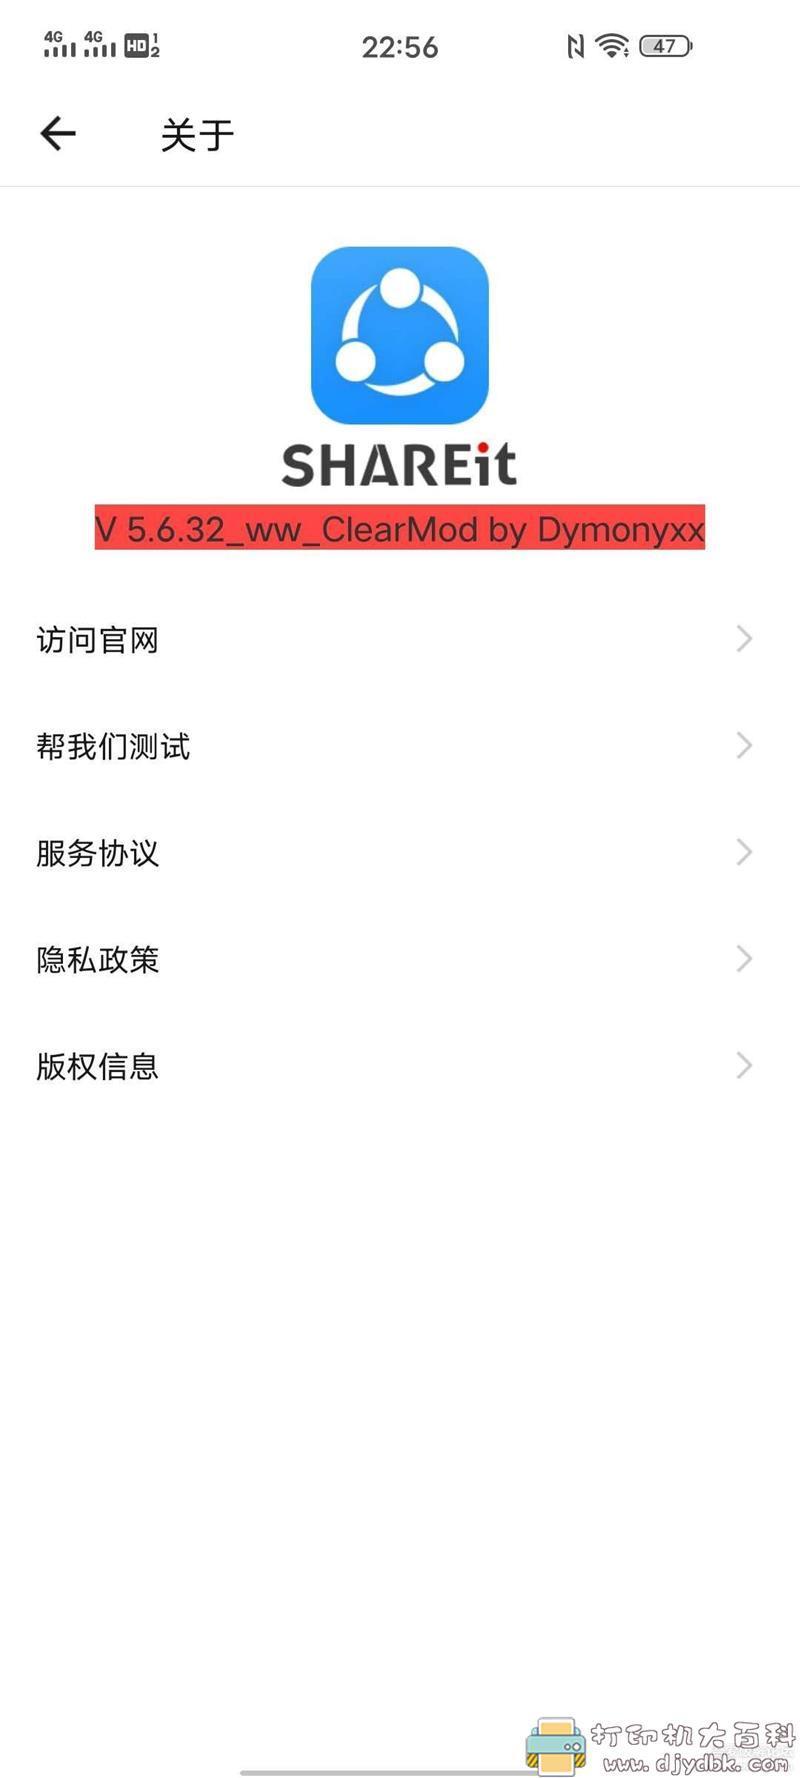 [Android]文件传输工具 SHAREit 共享v5.6.32 配图 No.2